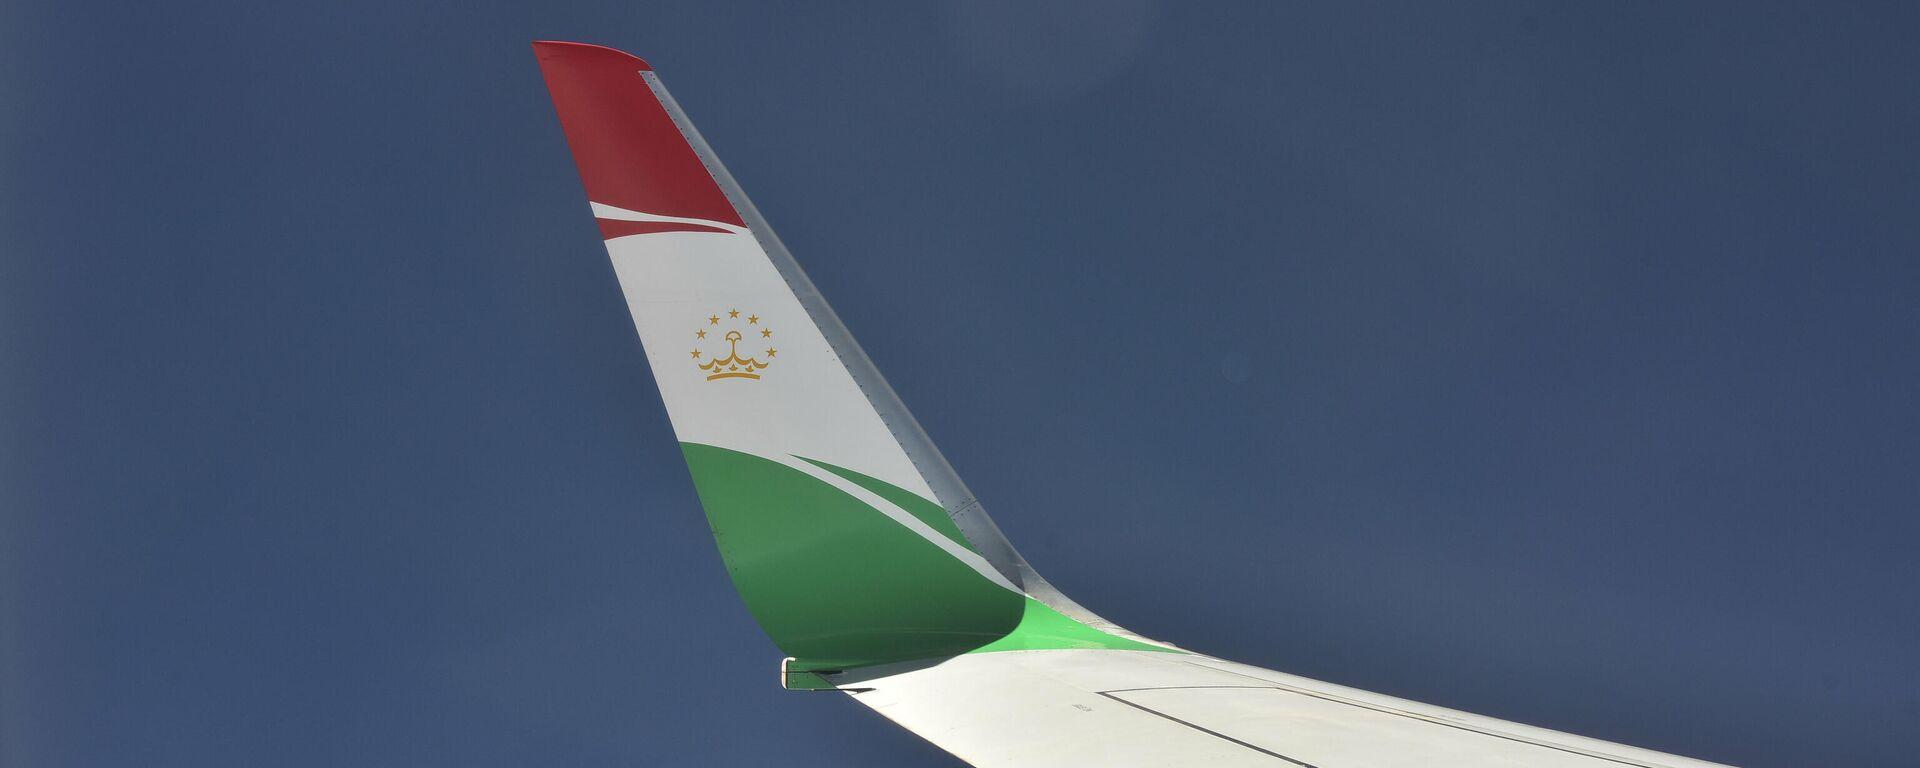 Вид из иллюминатора на крыло самолета президента Республики Таджикистан - Sputnik Таджикистан, 1920, 25.06.2021